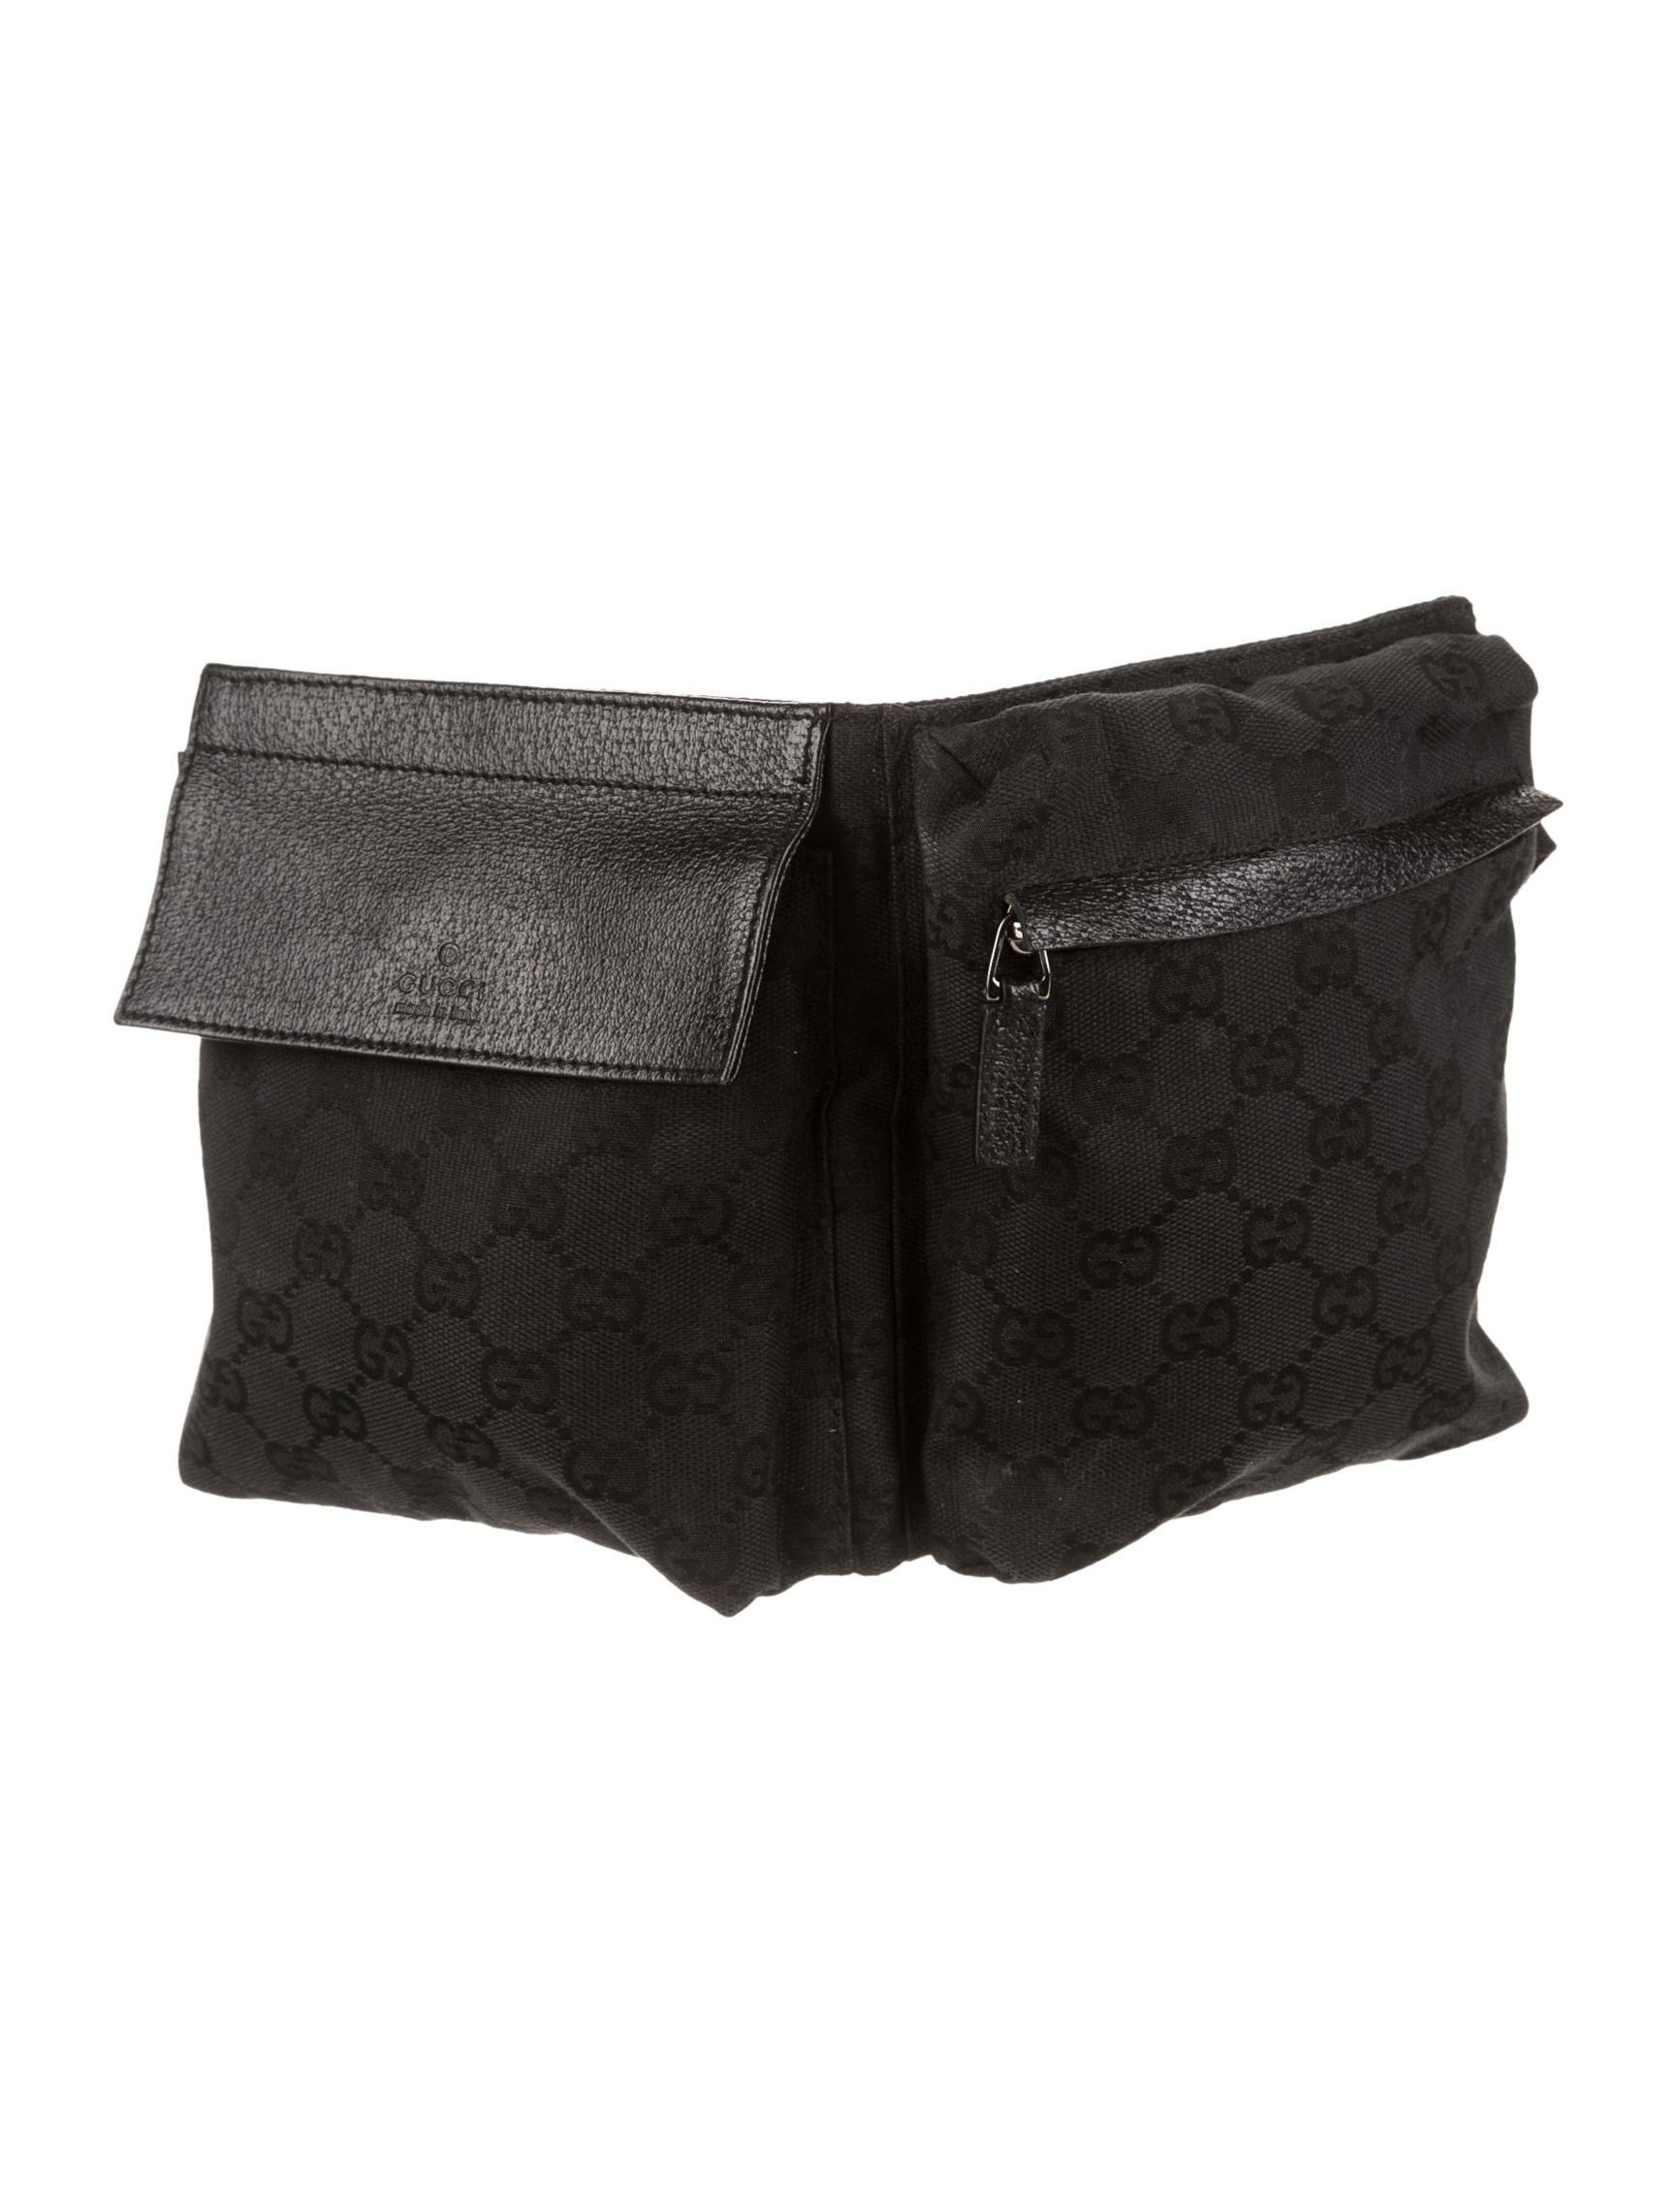 designer handbags sale online